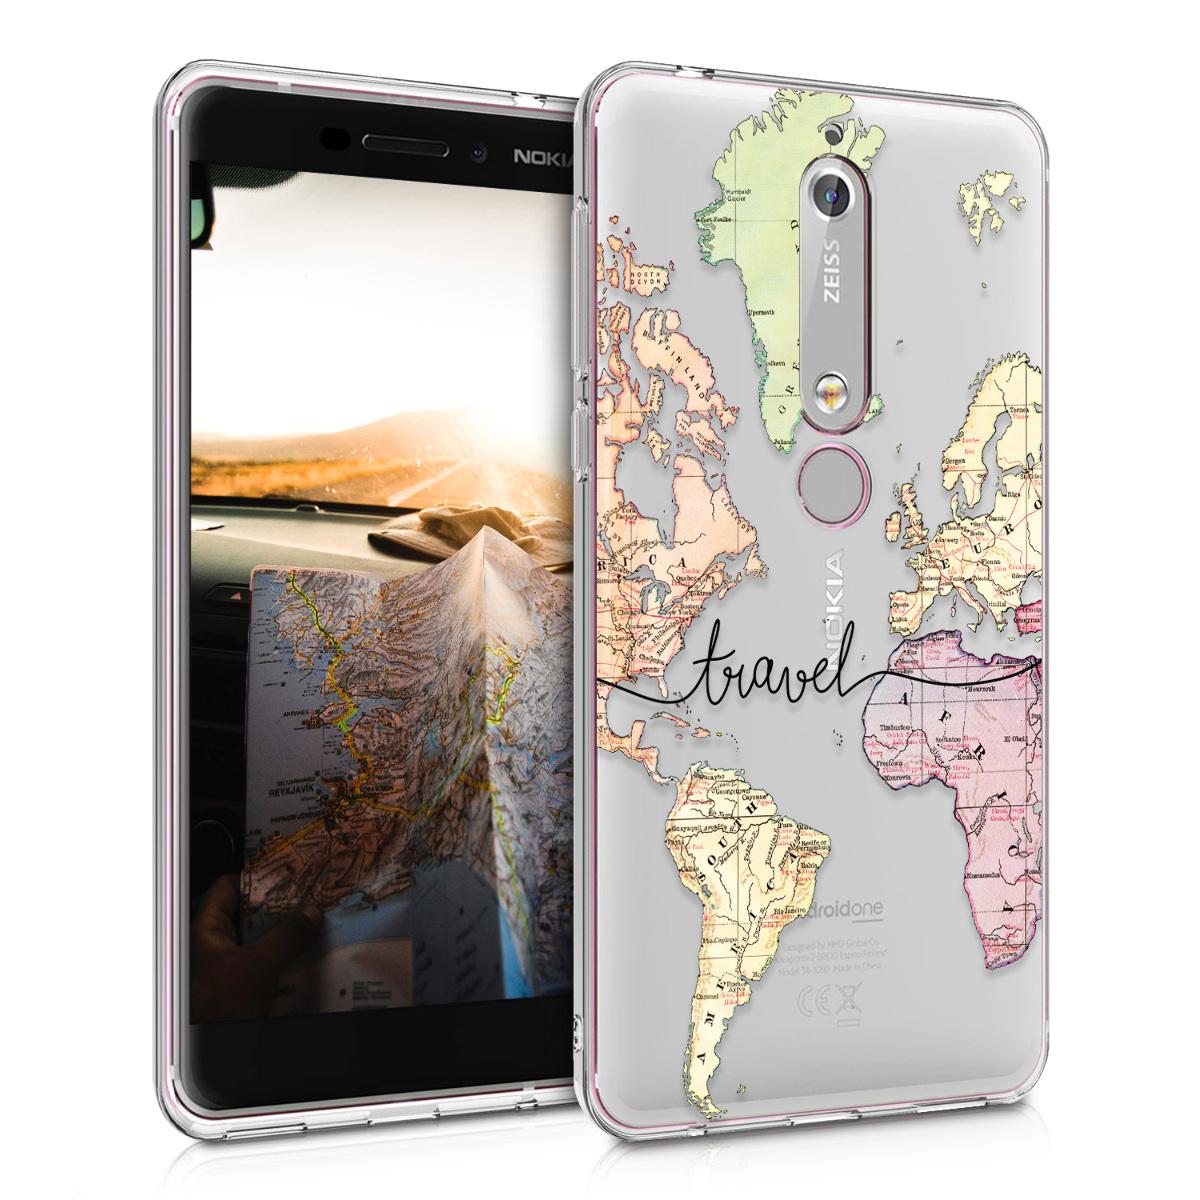 KW Θήκη Σιλικόνης Nokia 6.1 - Crystal Clear - Black / Multicolor / Transparent (44200.12)